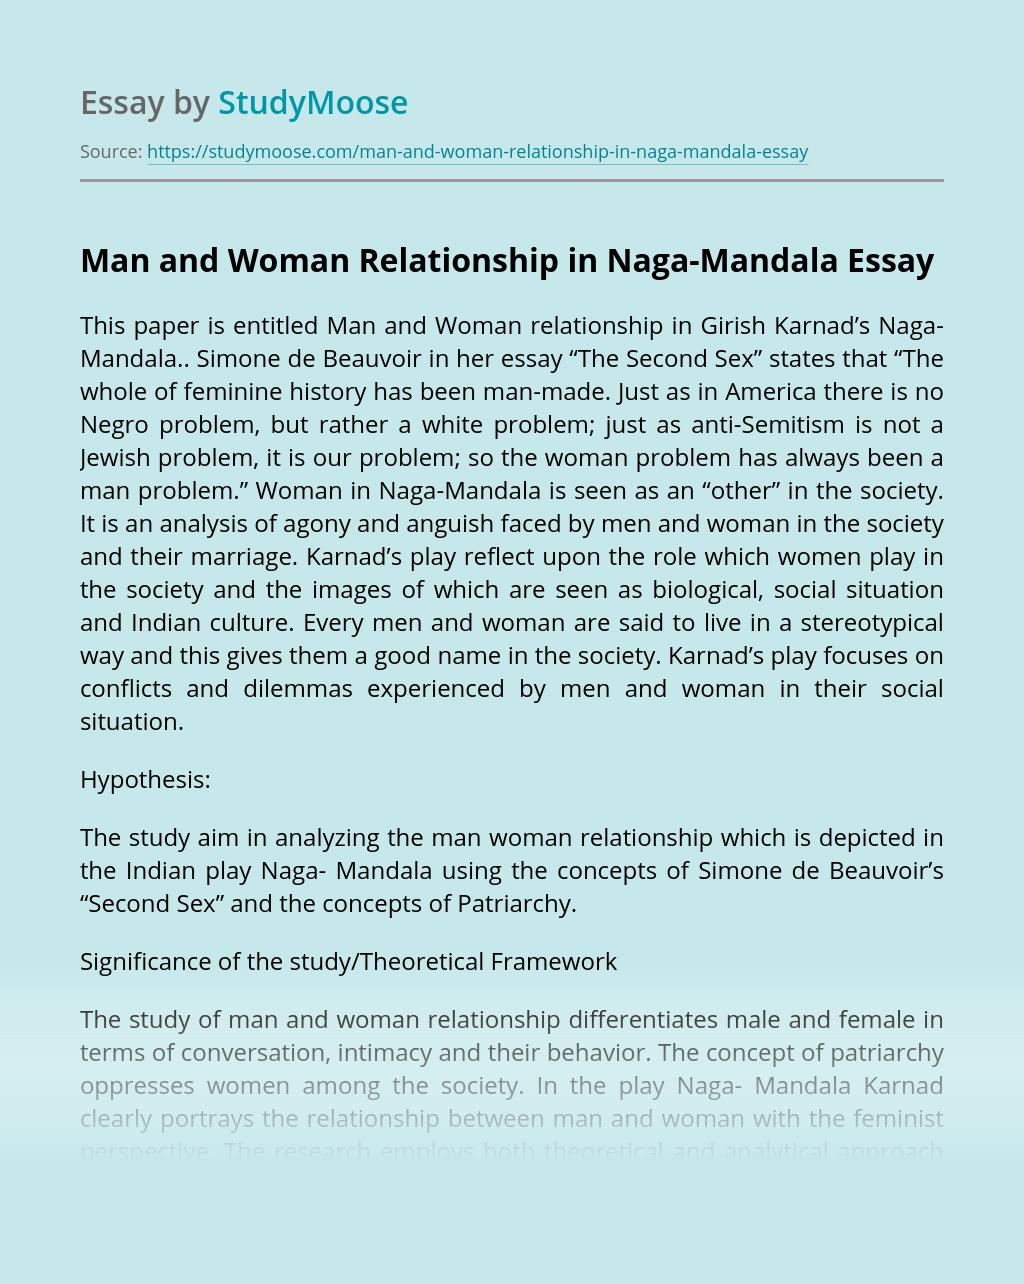 Man and Woman Relationship in Naga-Mandala